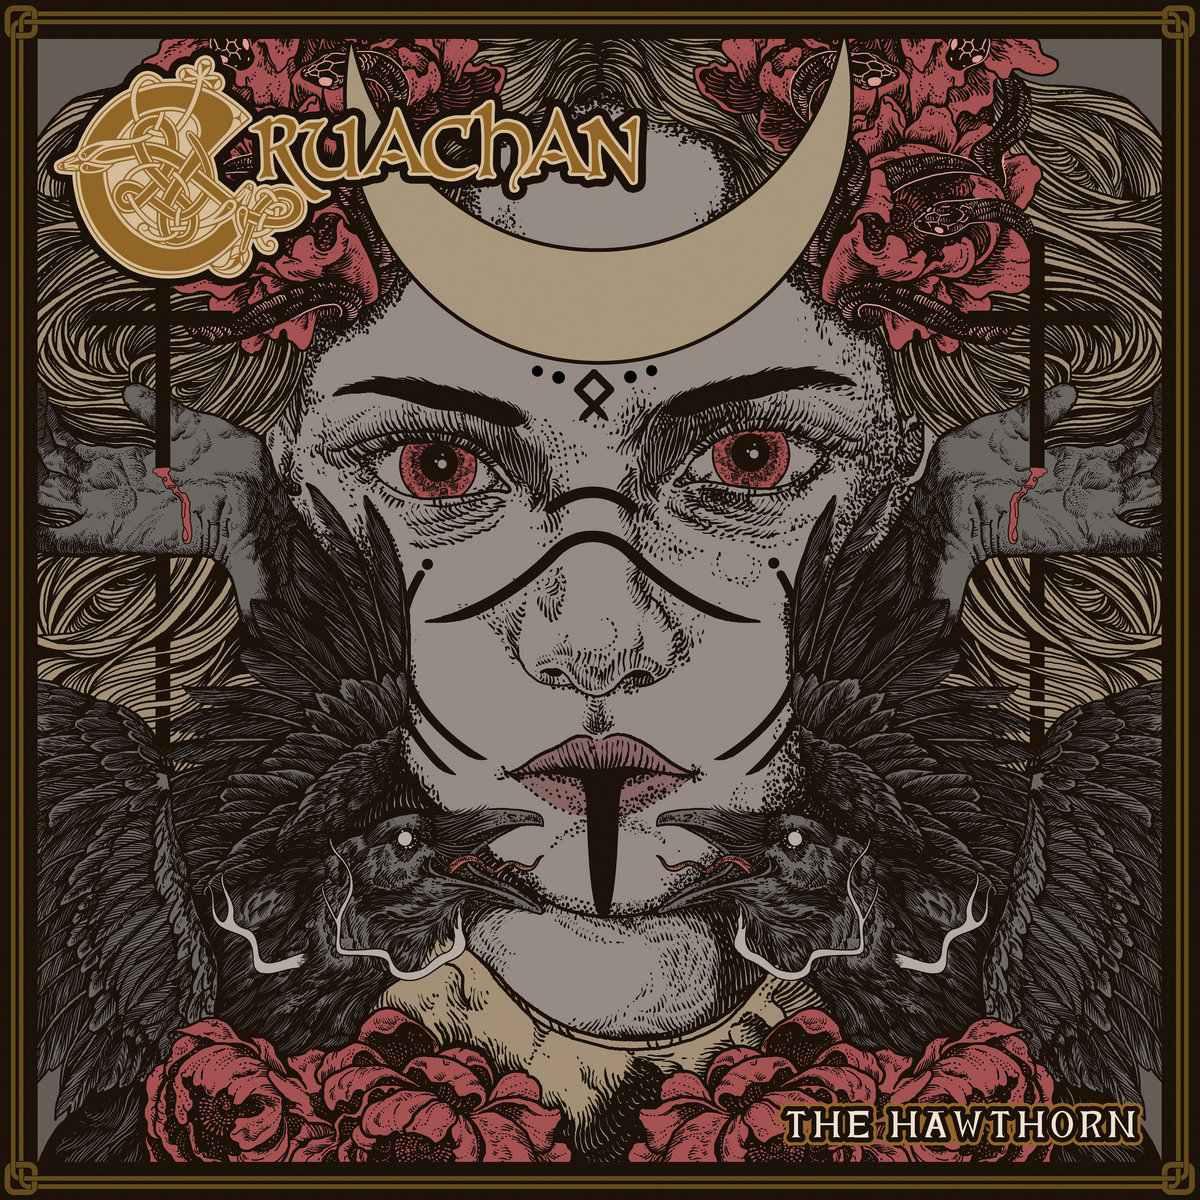 Cruachan - The Hawthorn